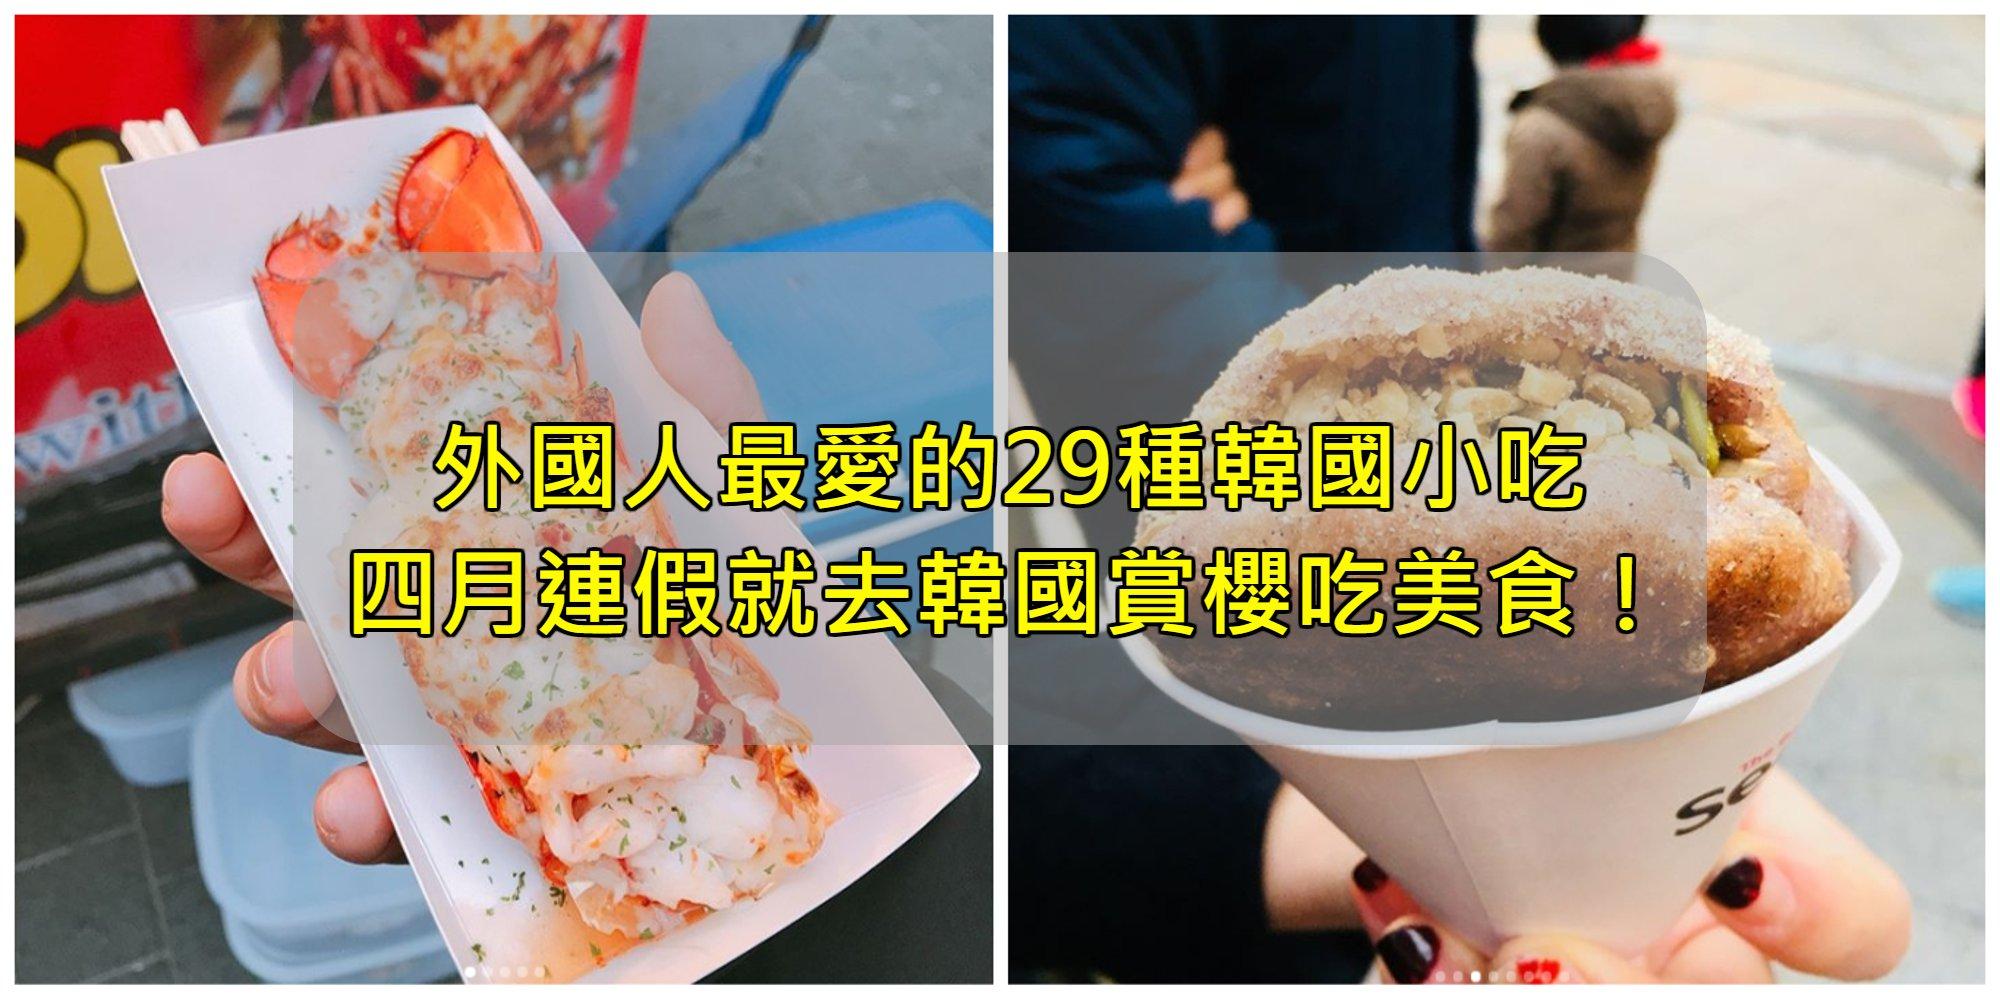 e59c96e789871.png?resize=412,232 - 新亞洲美食王國?外國人認證29種神好吃的韓國街頭美食大盤點!